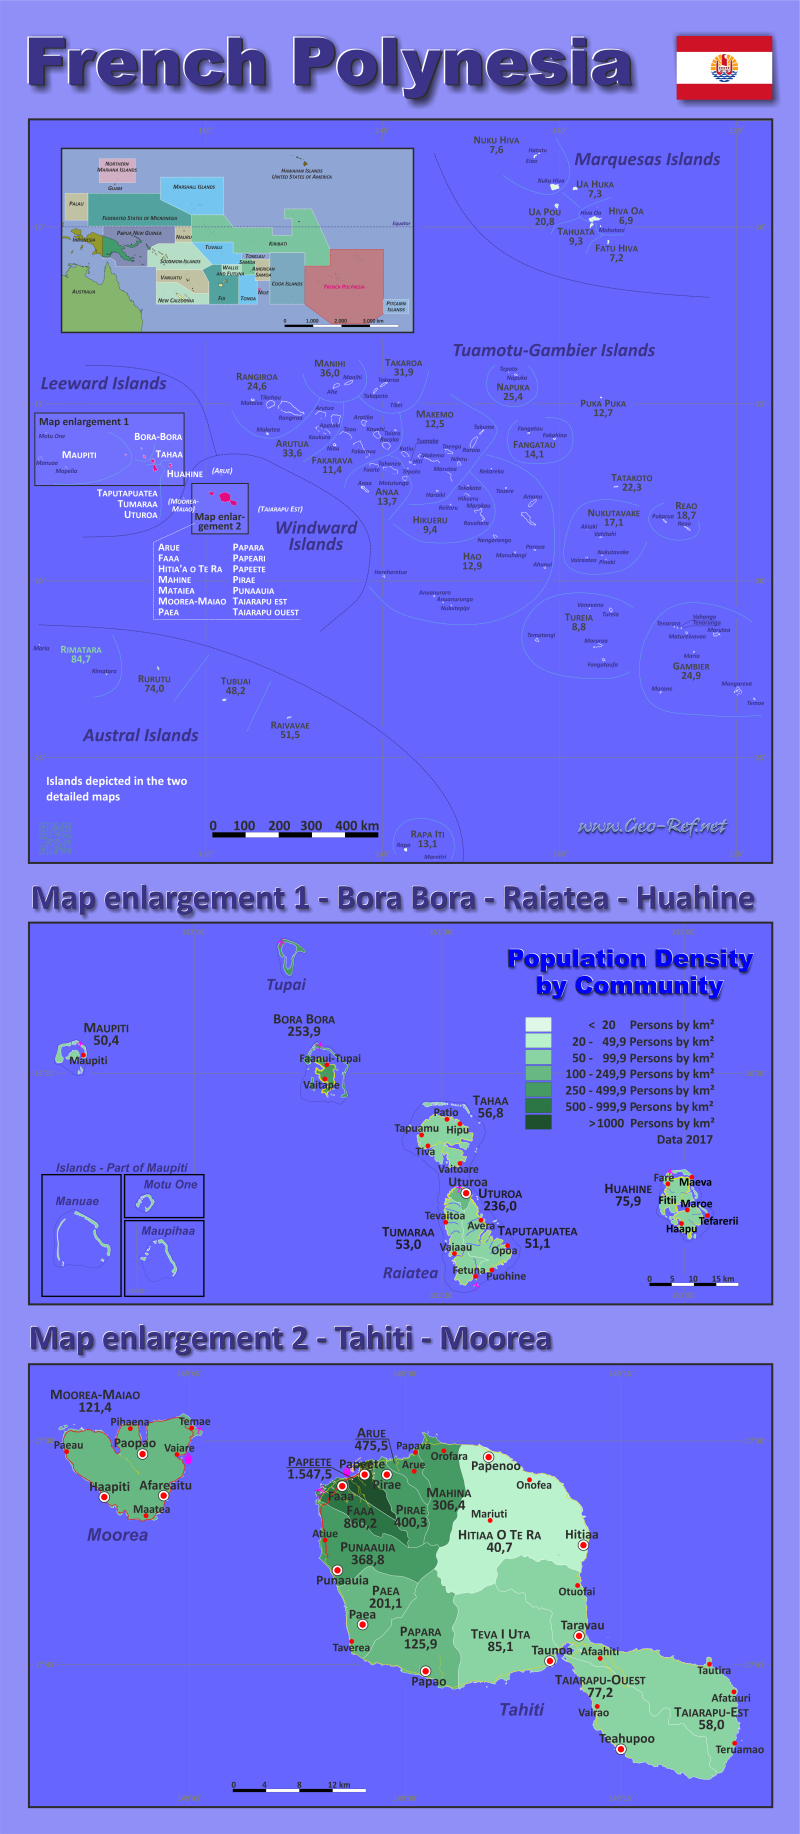 French Polynesia Country Part - 16: Map French Polynesia - Population Density